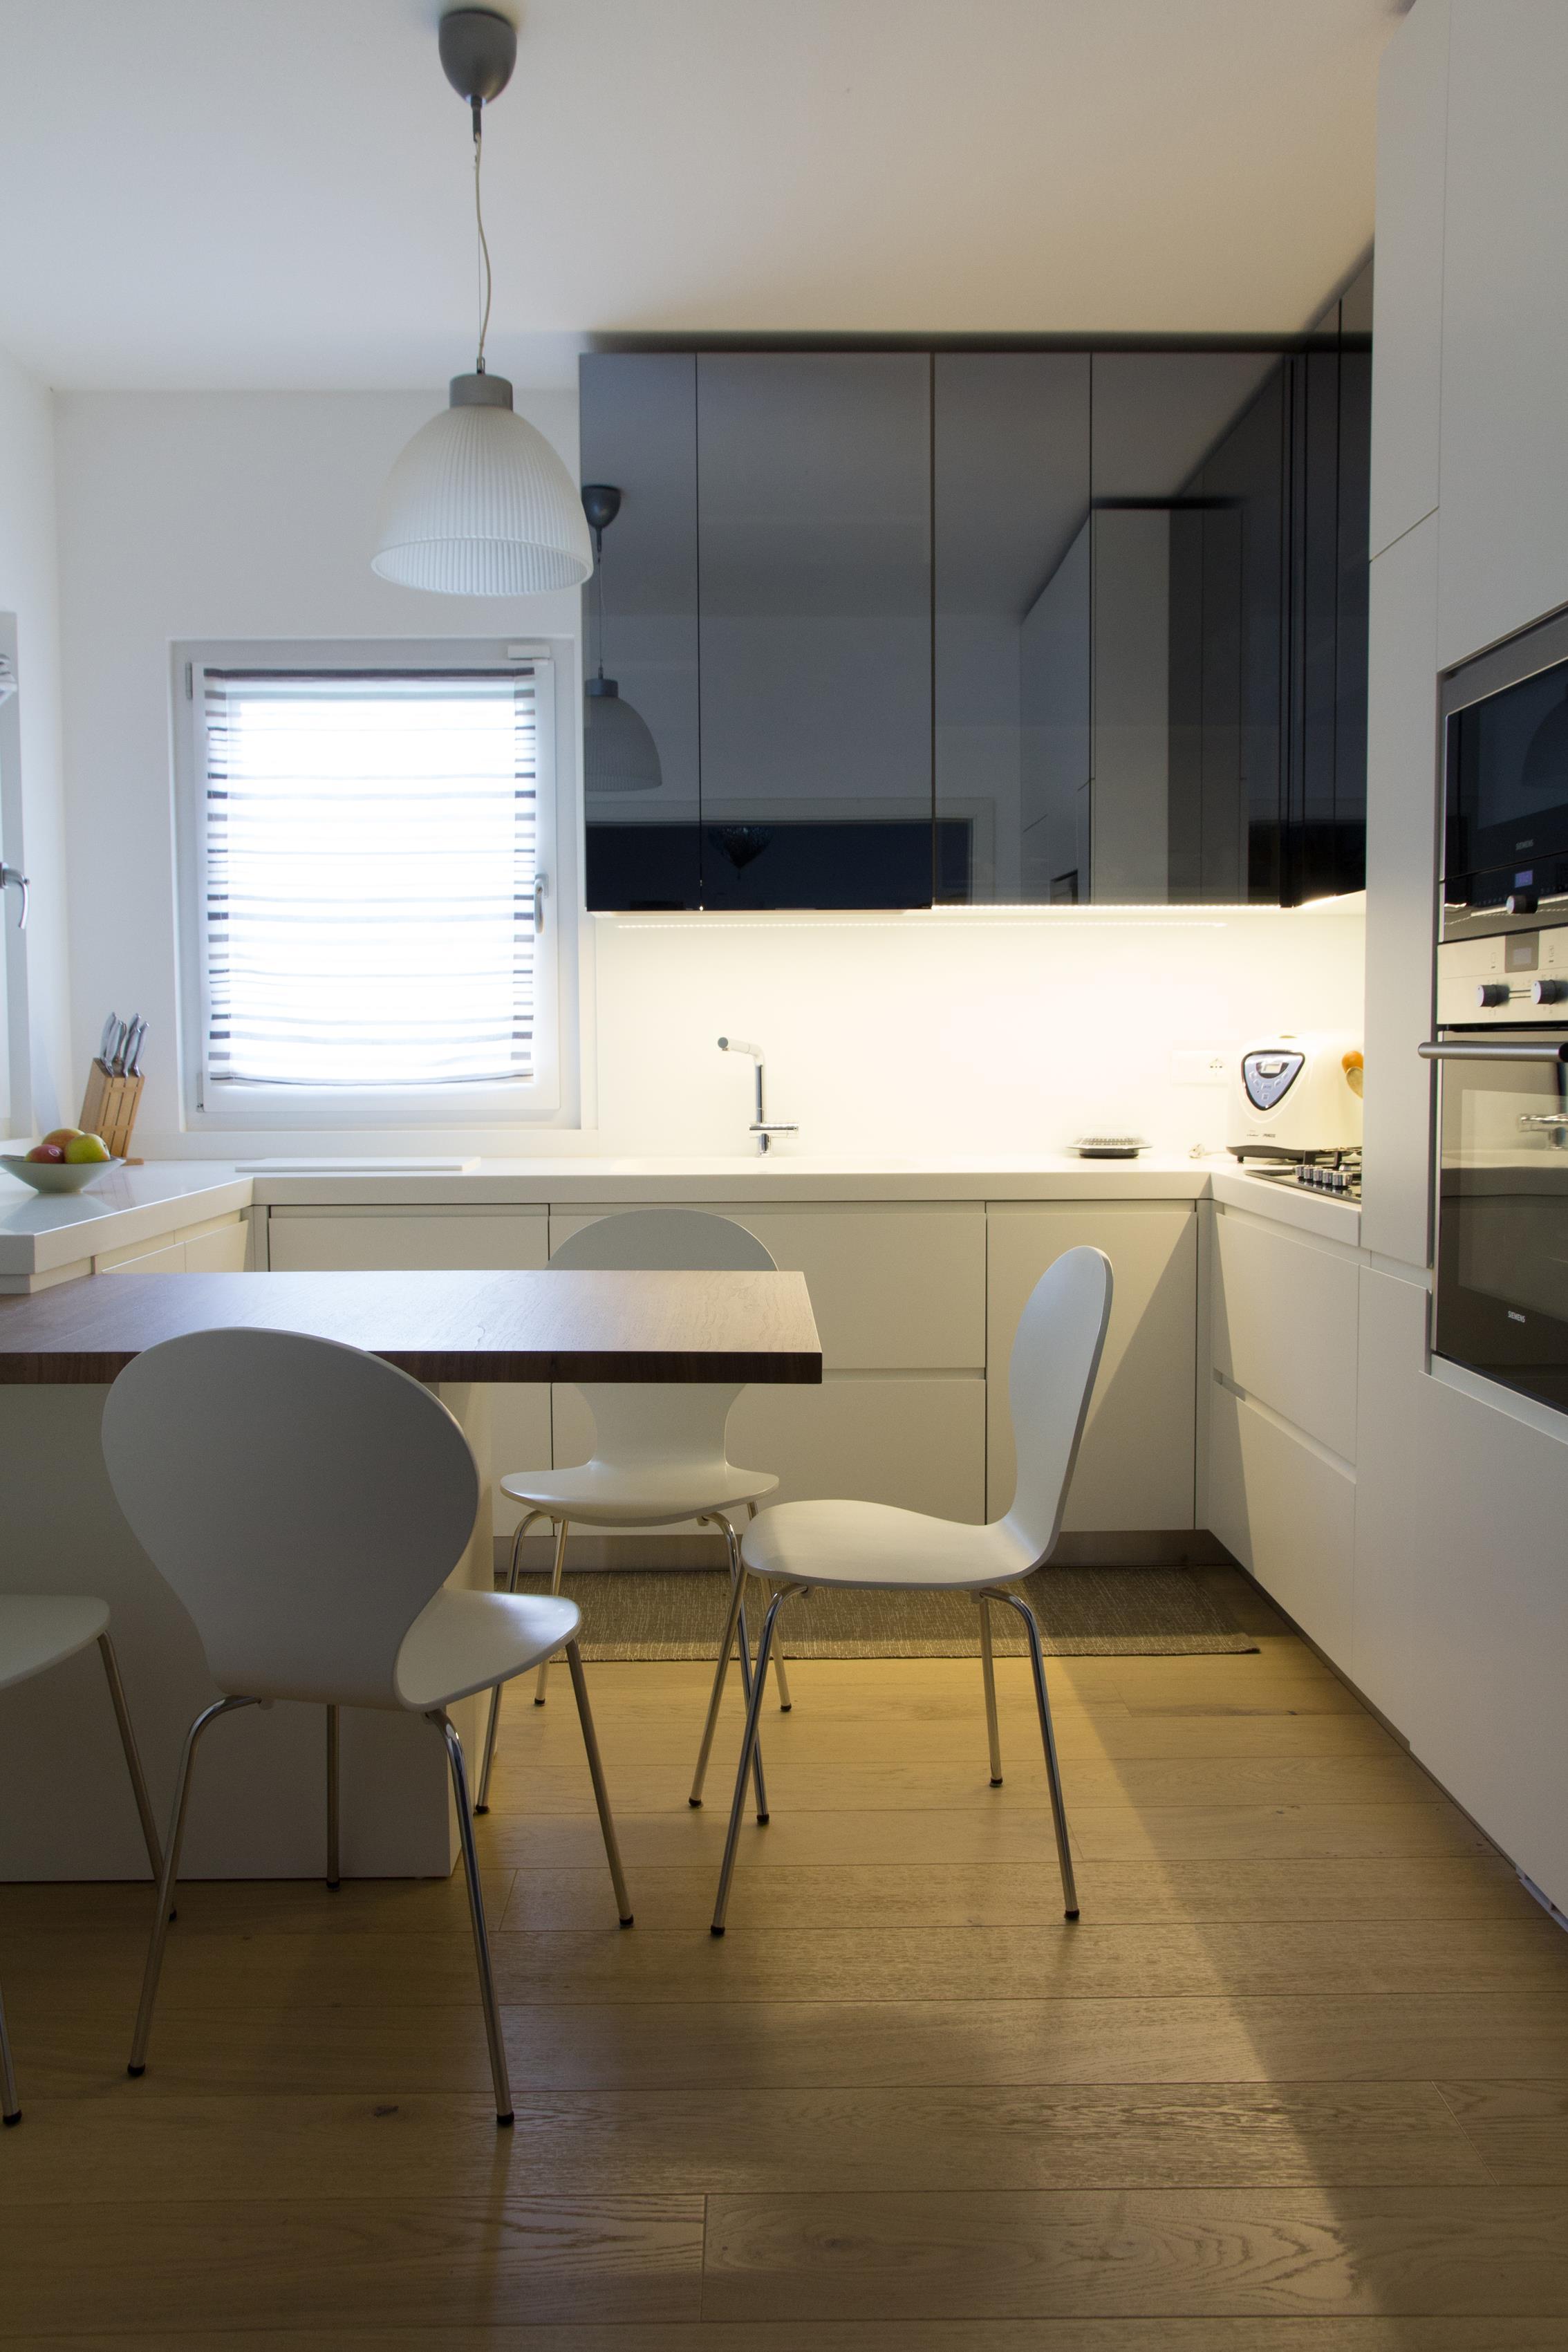 Cucine pensili perfect cucine moderna in legno su misura for Pensili cucina